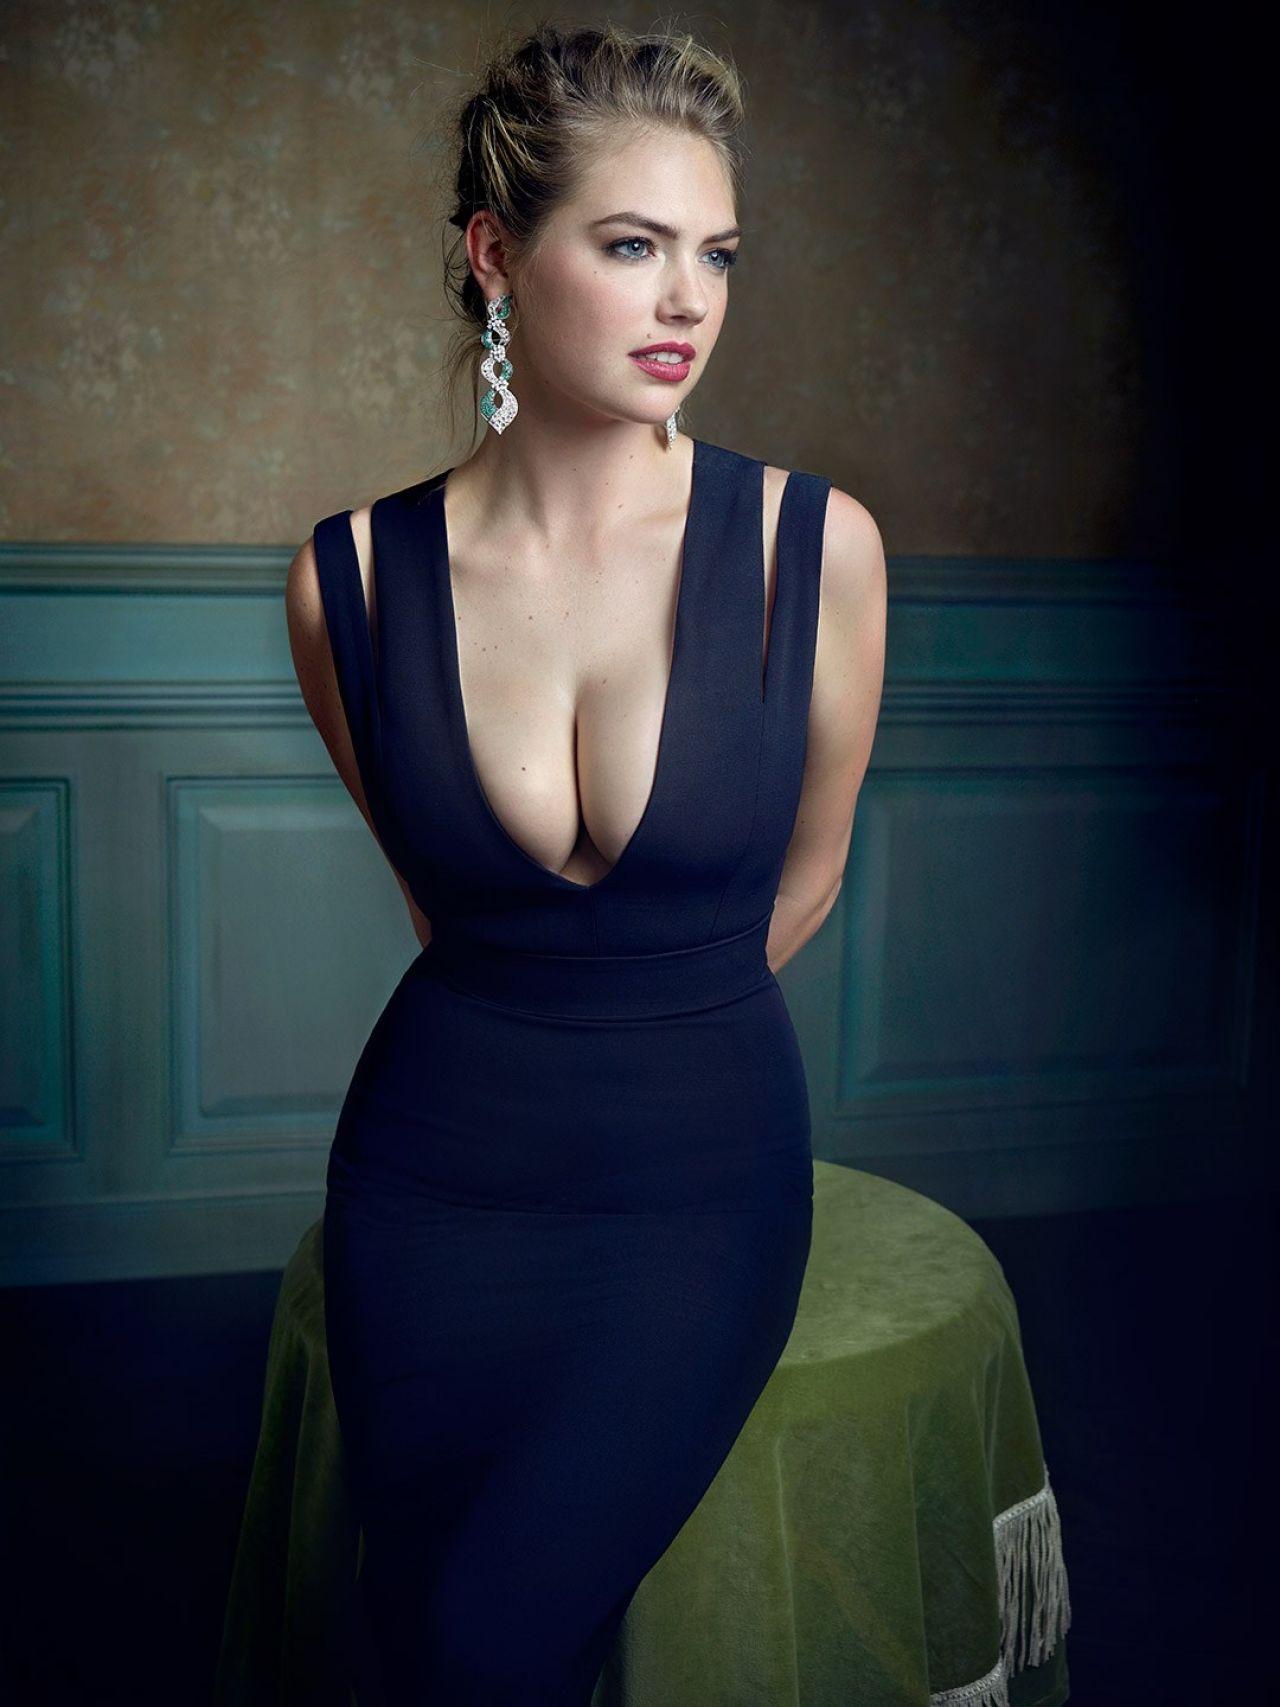 Kate Upton 2016 Vanity Fair Oscar Party Portrait